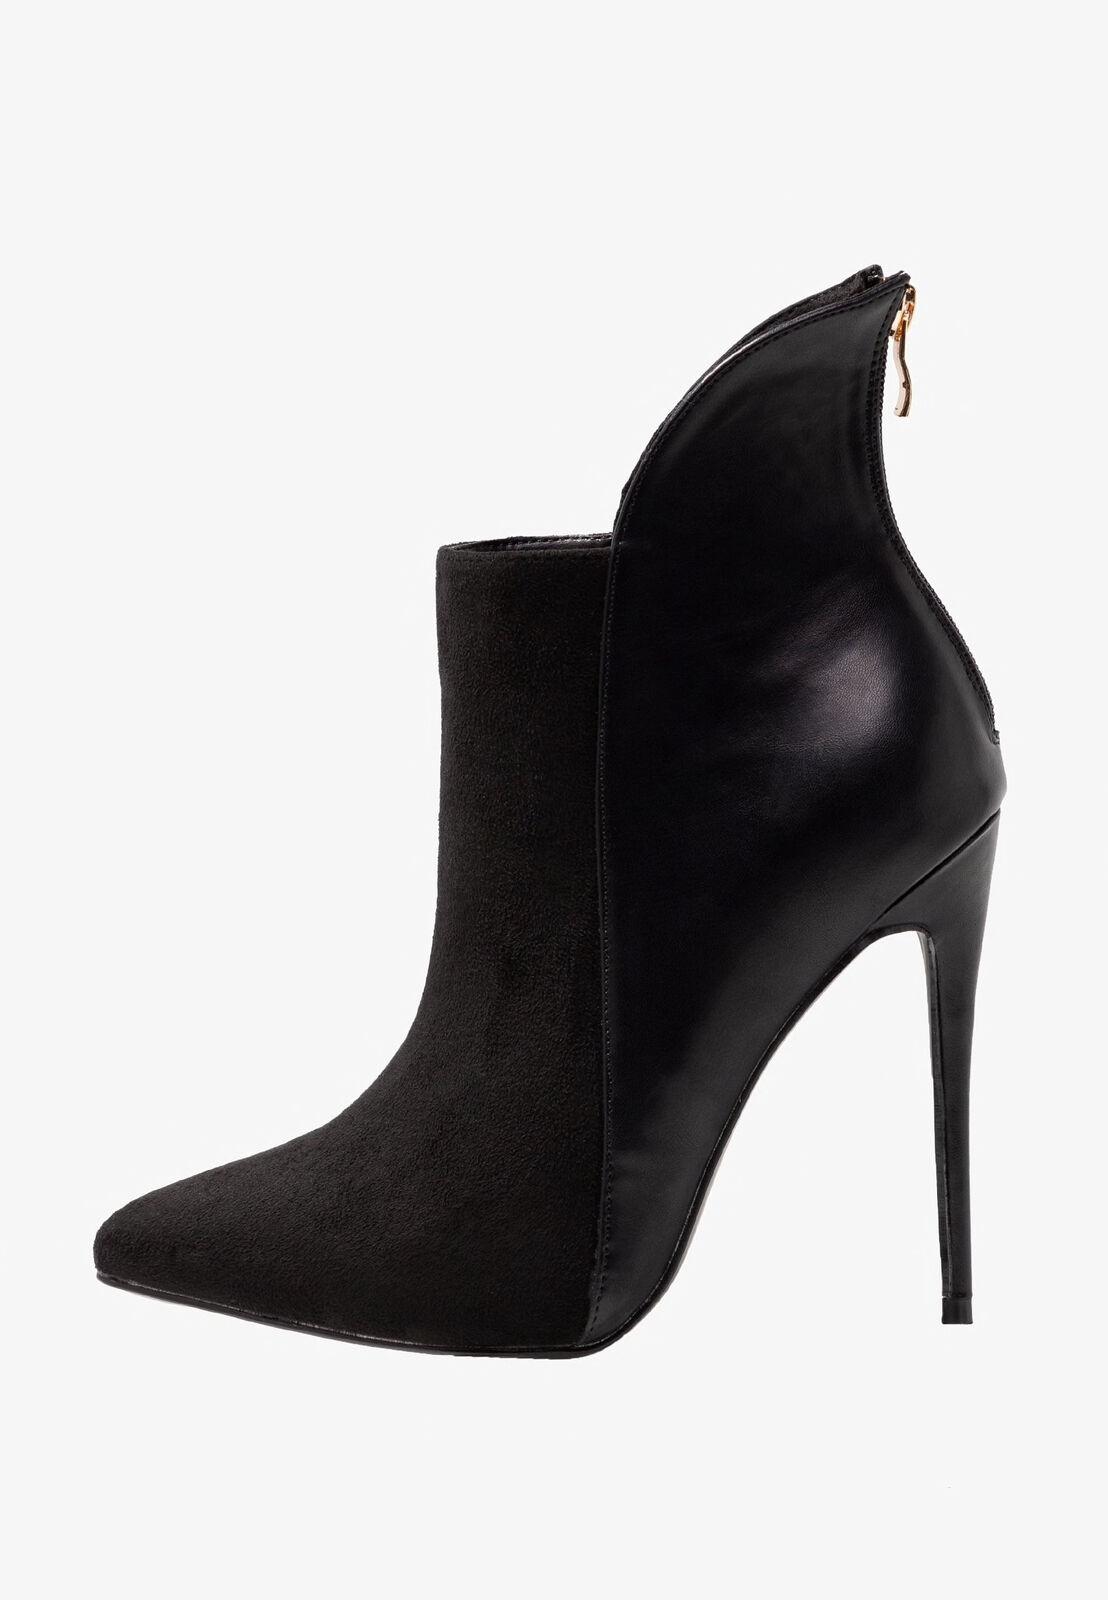 Lost Ink Wide Fit Mimi Back Counter Stilleto-High Heeled Ankle Stiefel UK5 EU38